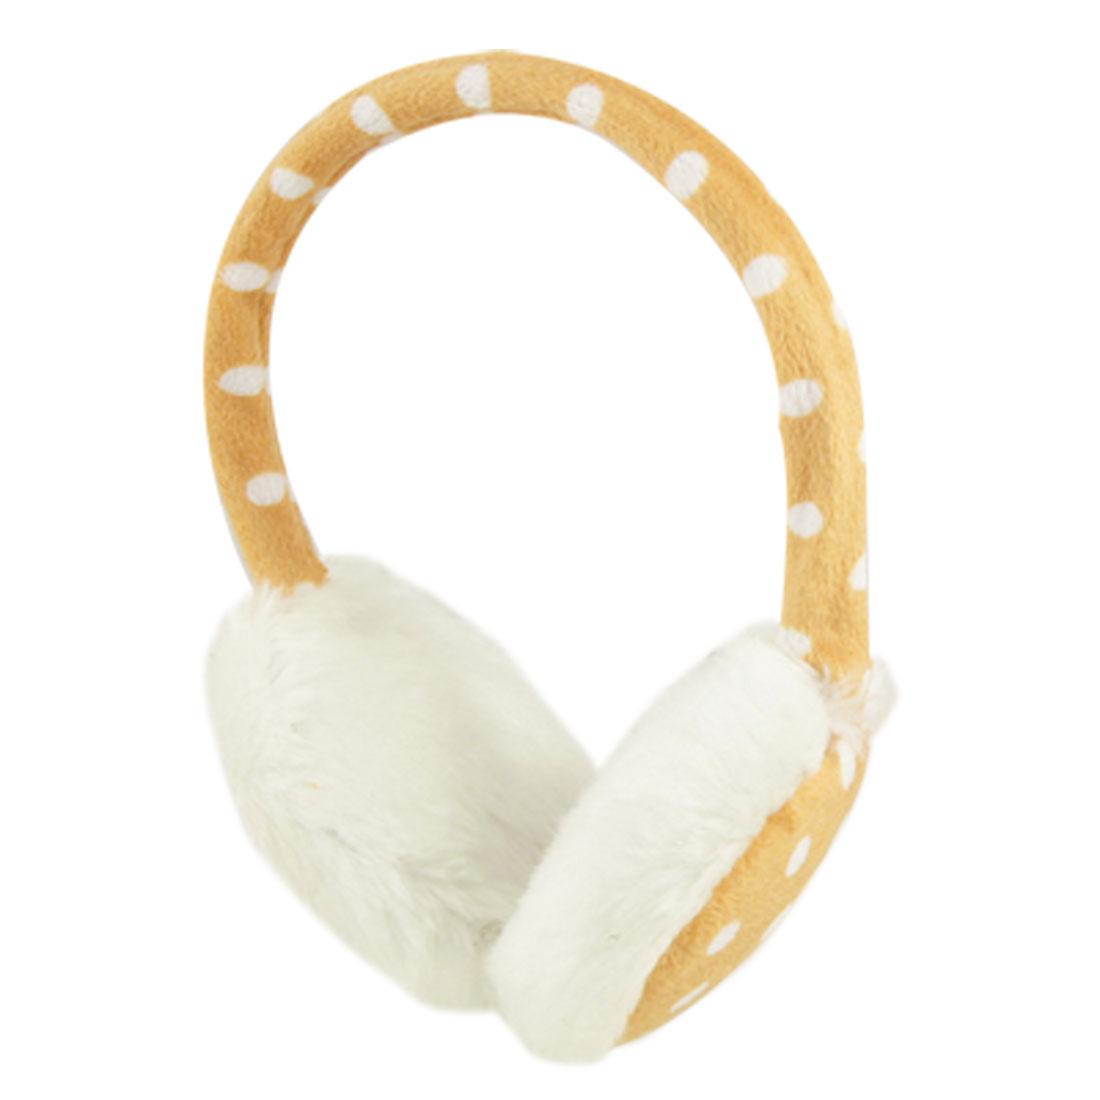 "Women 3.5"" Pad Dotted Plush Ear Cover Warmer Earmuffs White Khaki"